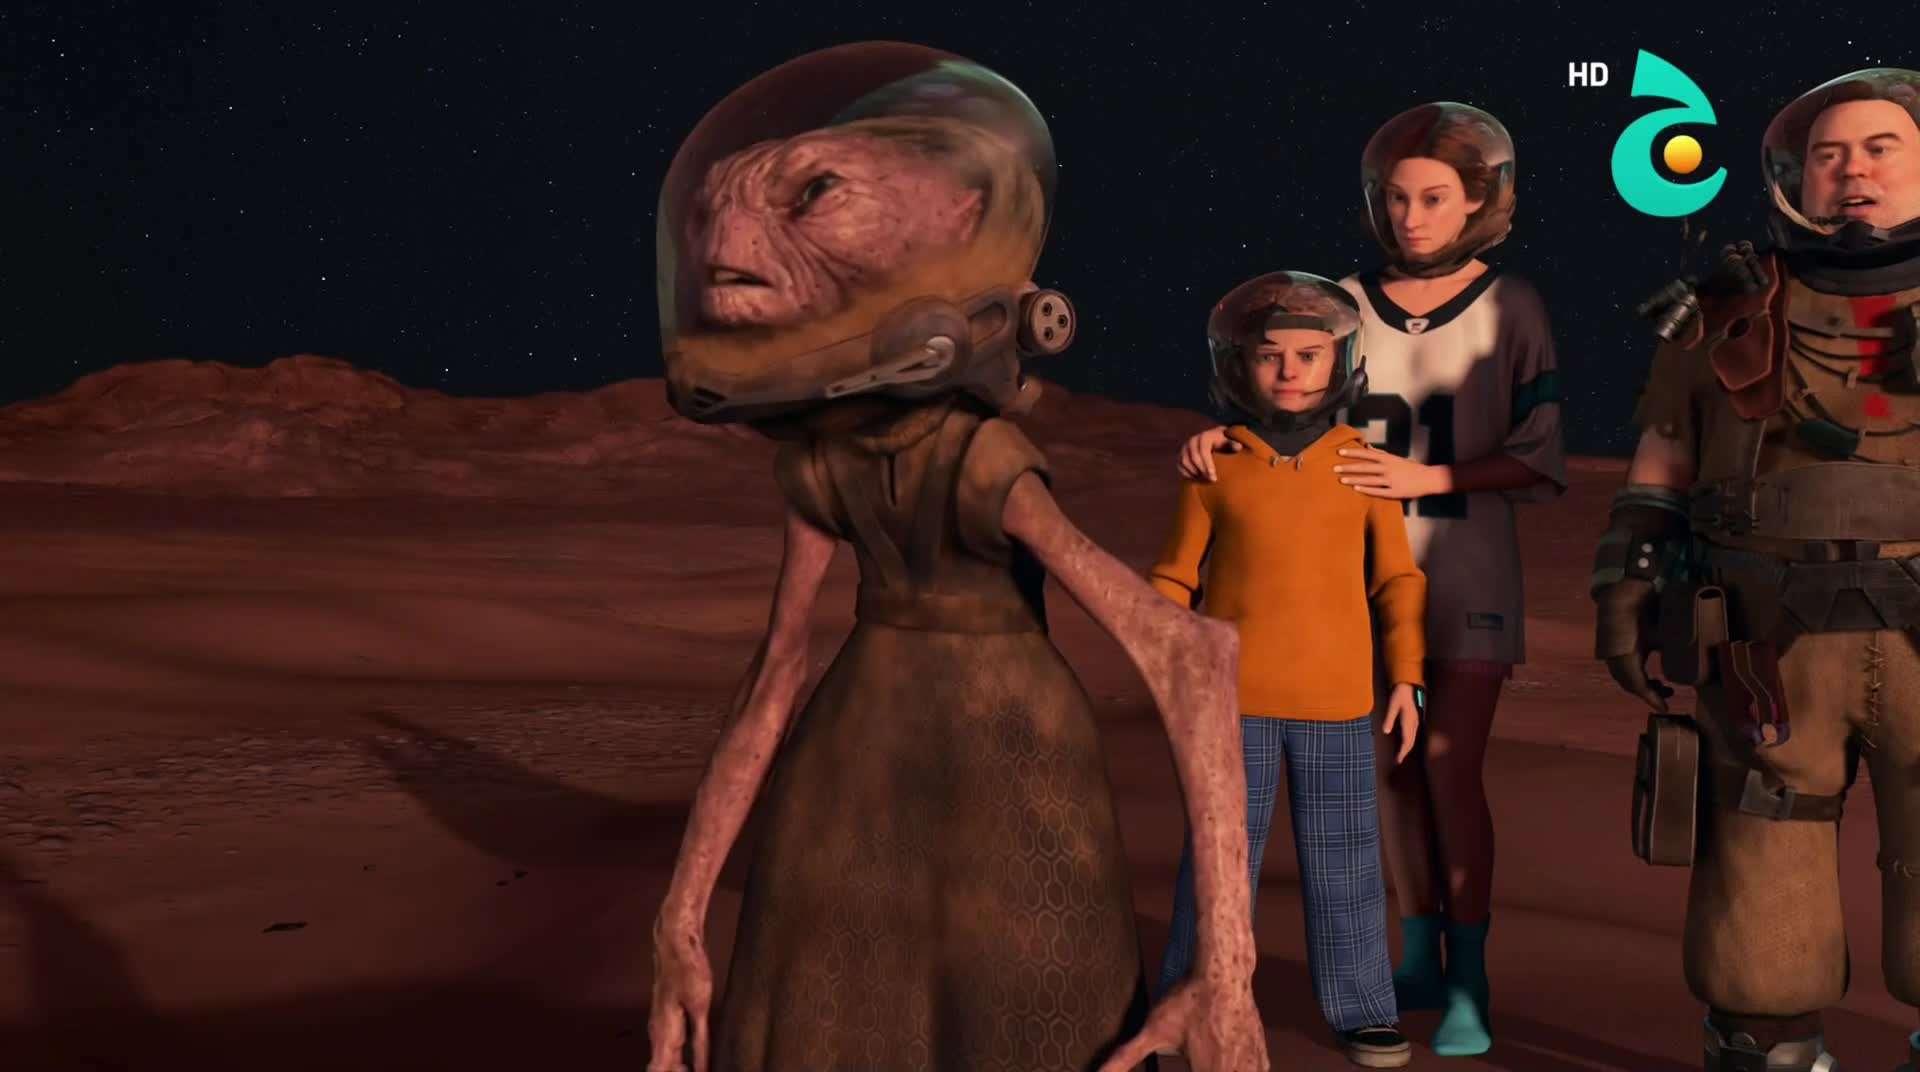 ميلو ورحلة الانقاذ Mars Needs Moms (2011) HDTV 1080p تحميل تورنت 17 arabp2p.com